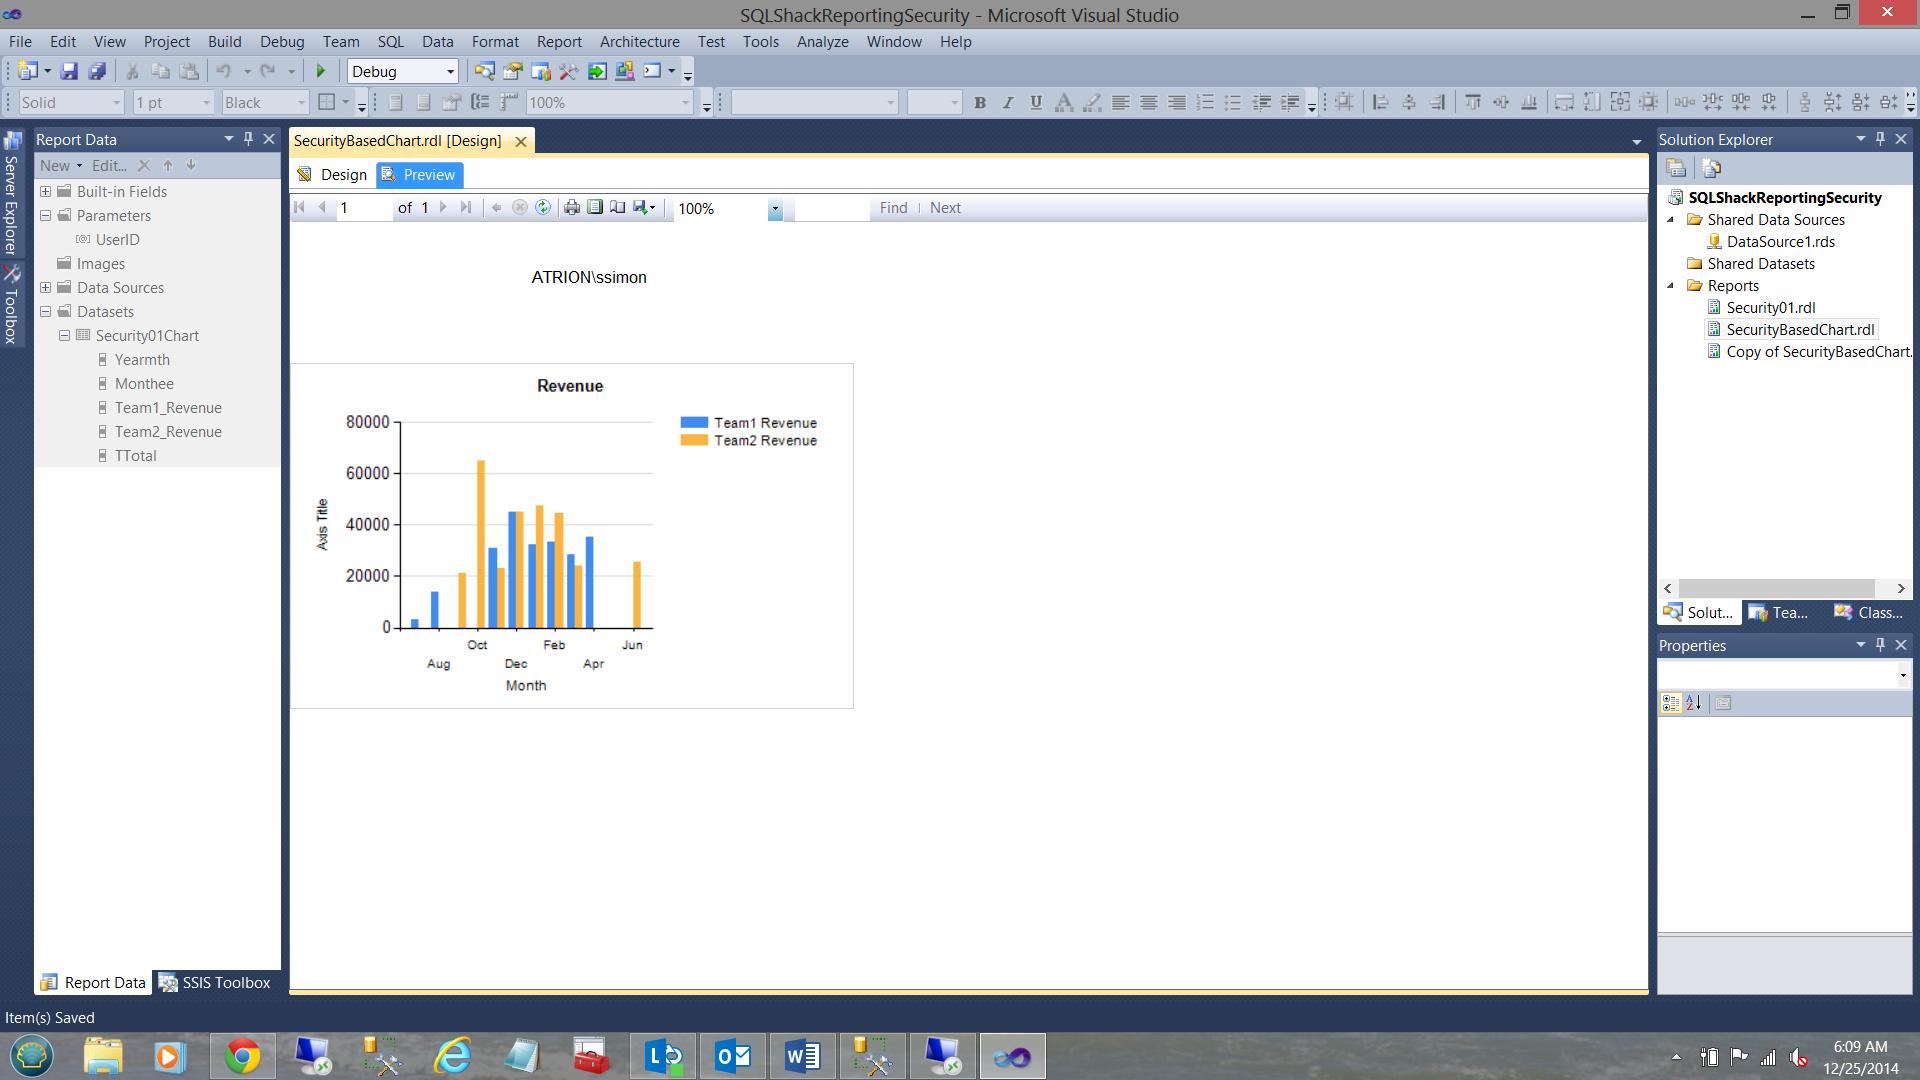 SQL Server安全机制–如何控制用户能够在报告中查看哪些数据33